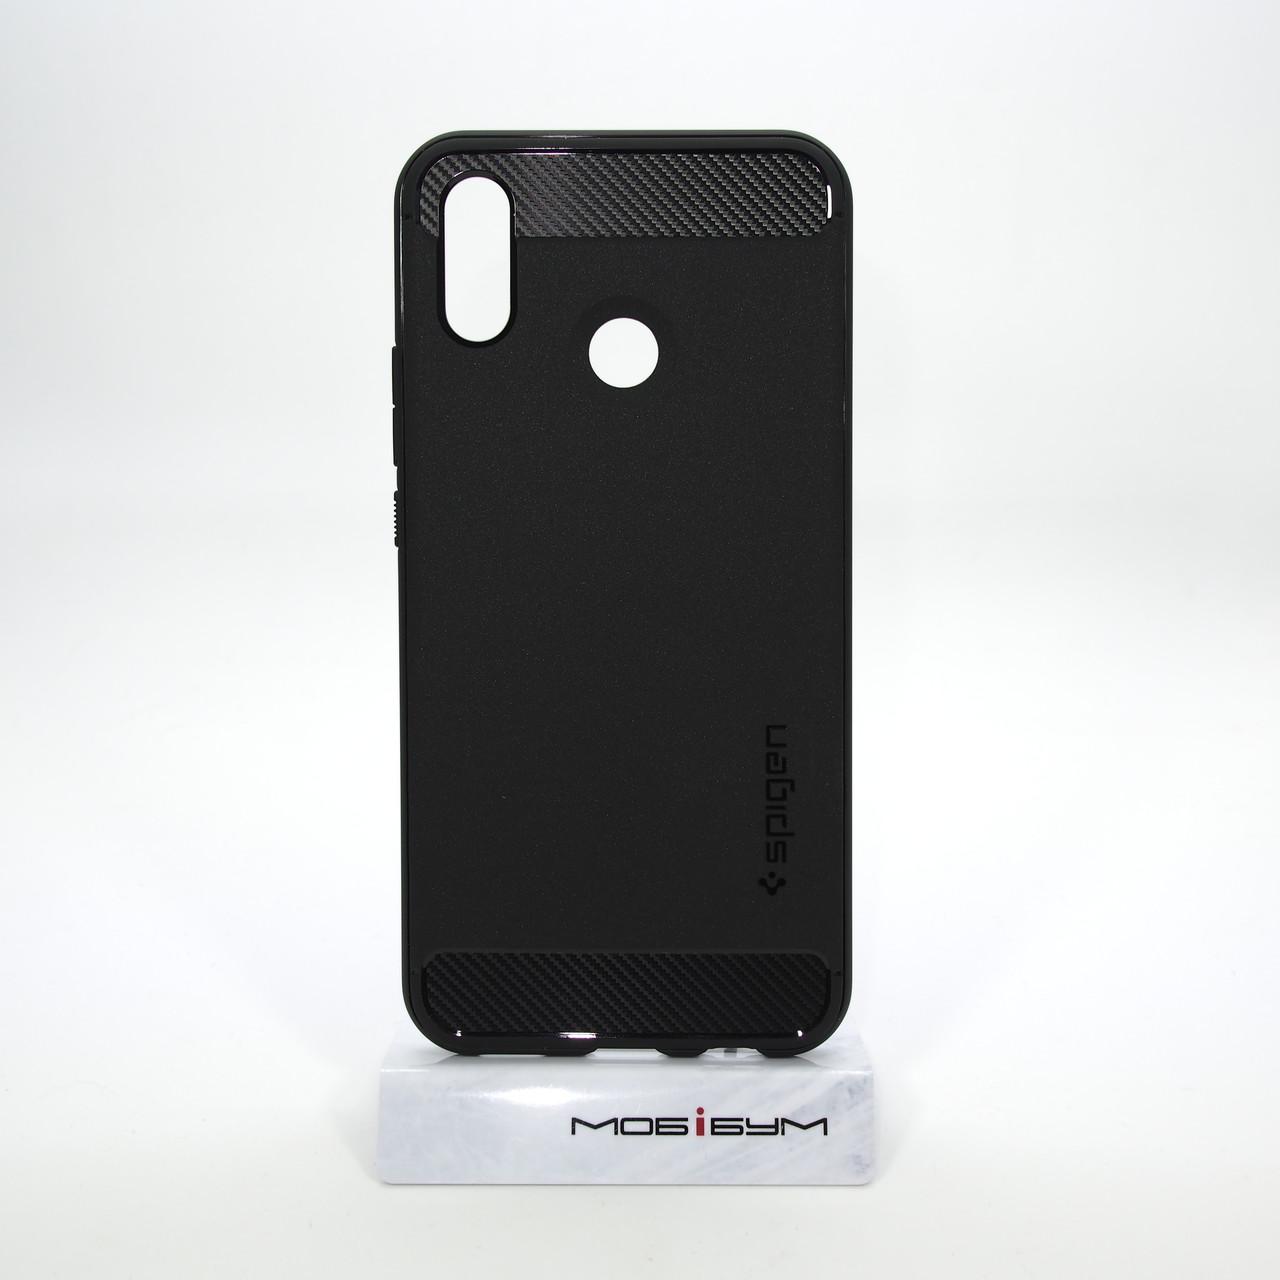 Spigen Rugged Armor Huawei Nova 3i Резина Для телефона Панель (Накладка на корпус) P Smart Plus